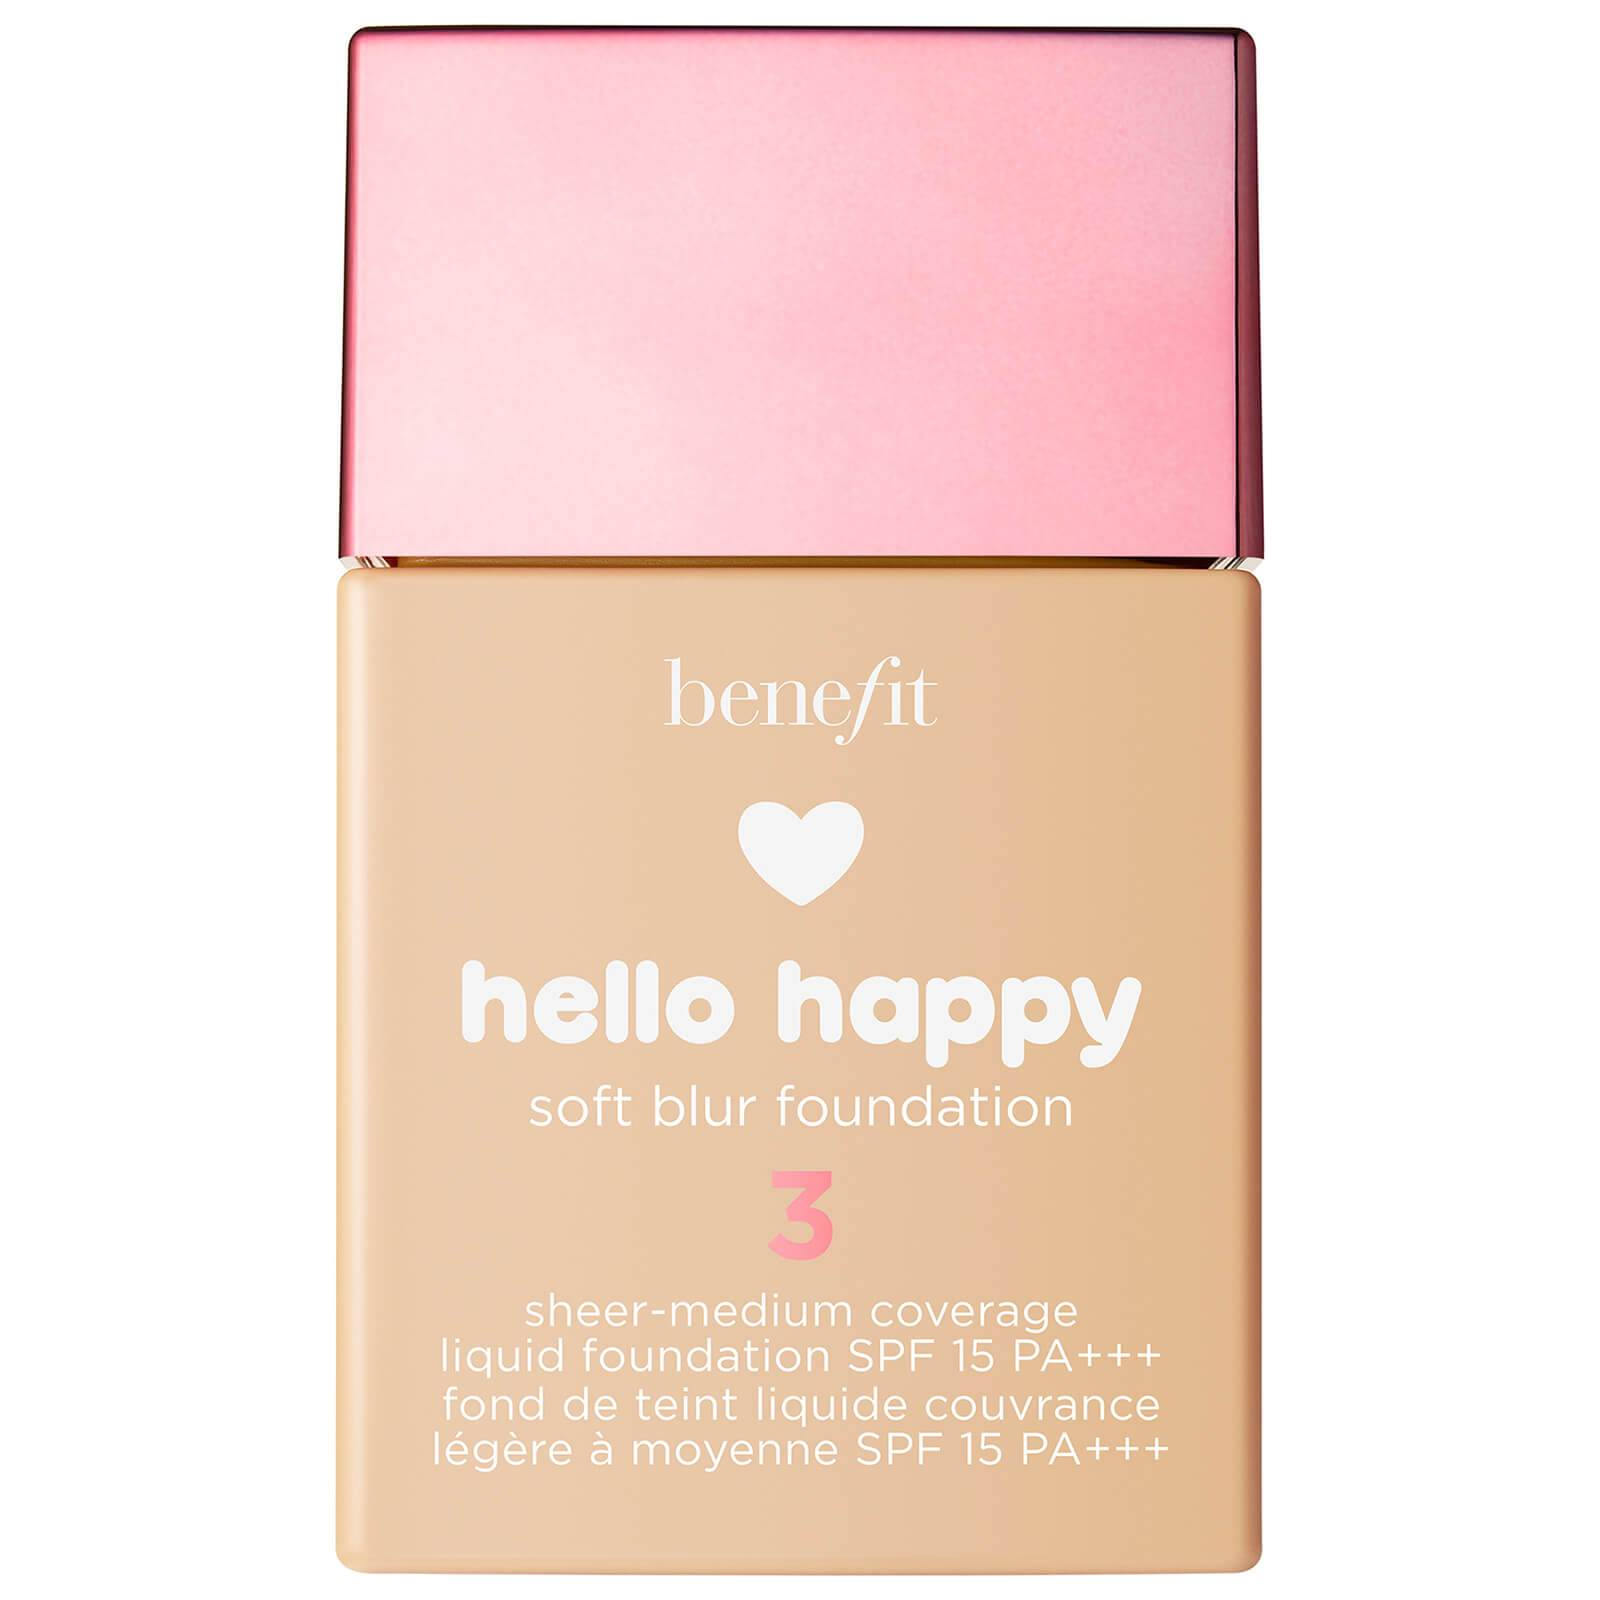 Benefit Hello Happy Soft Blur Foundation (Various Shades) - 3